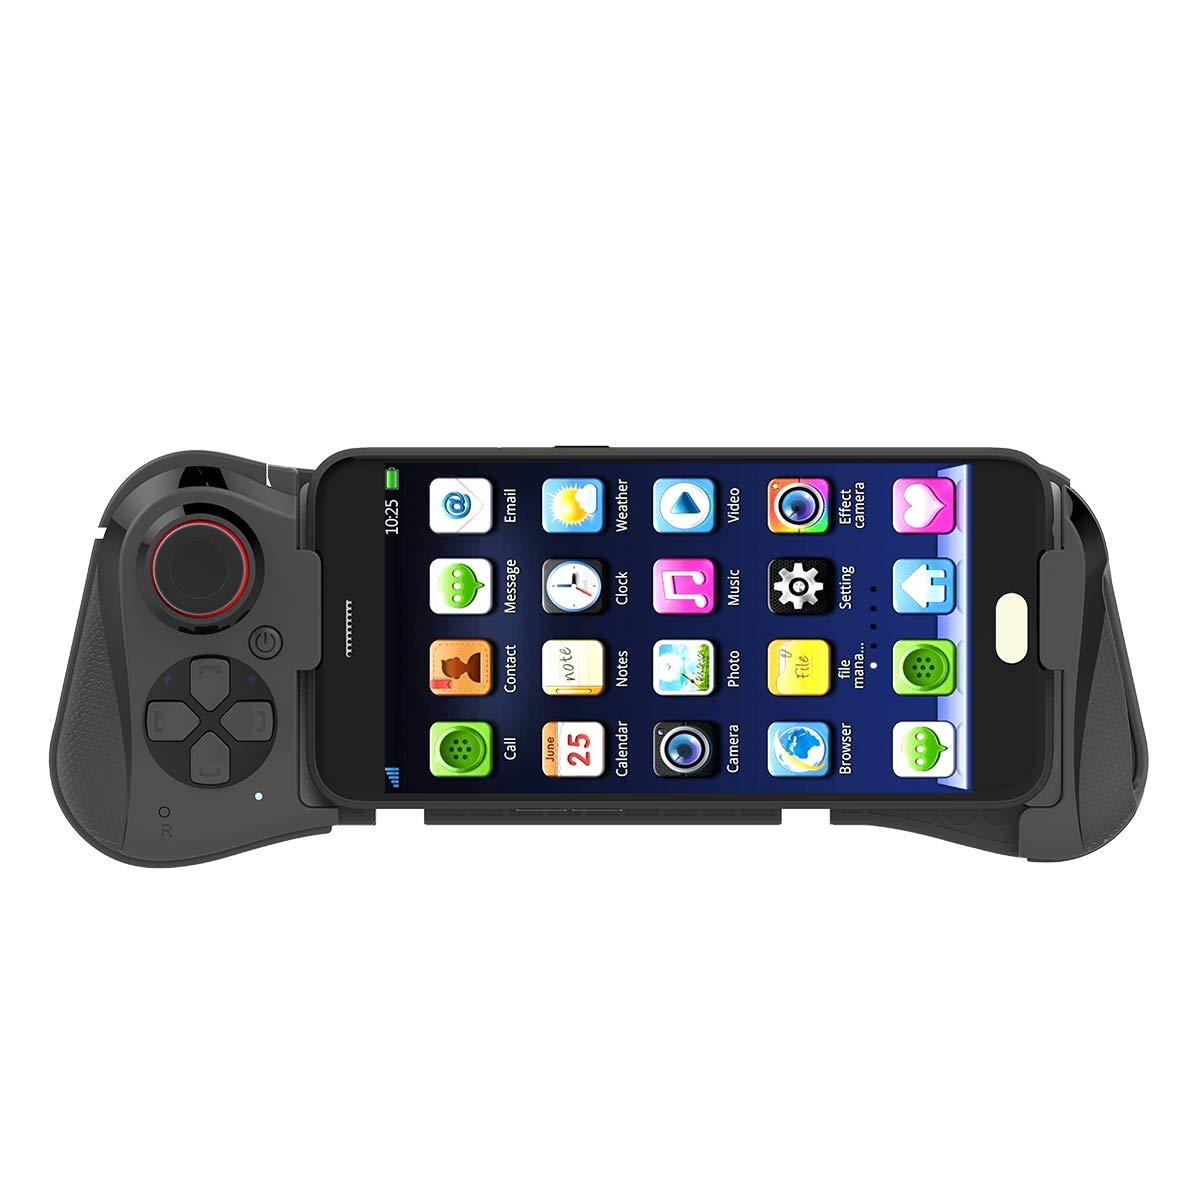 Mocute 058 inalámbrico Bluetooth Gamepad controlador de juegos para Samsung teléfono Android Pubg juego telescópico Joystick